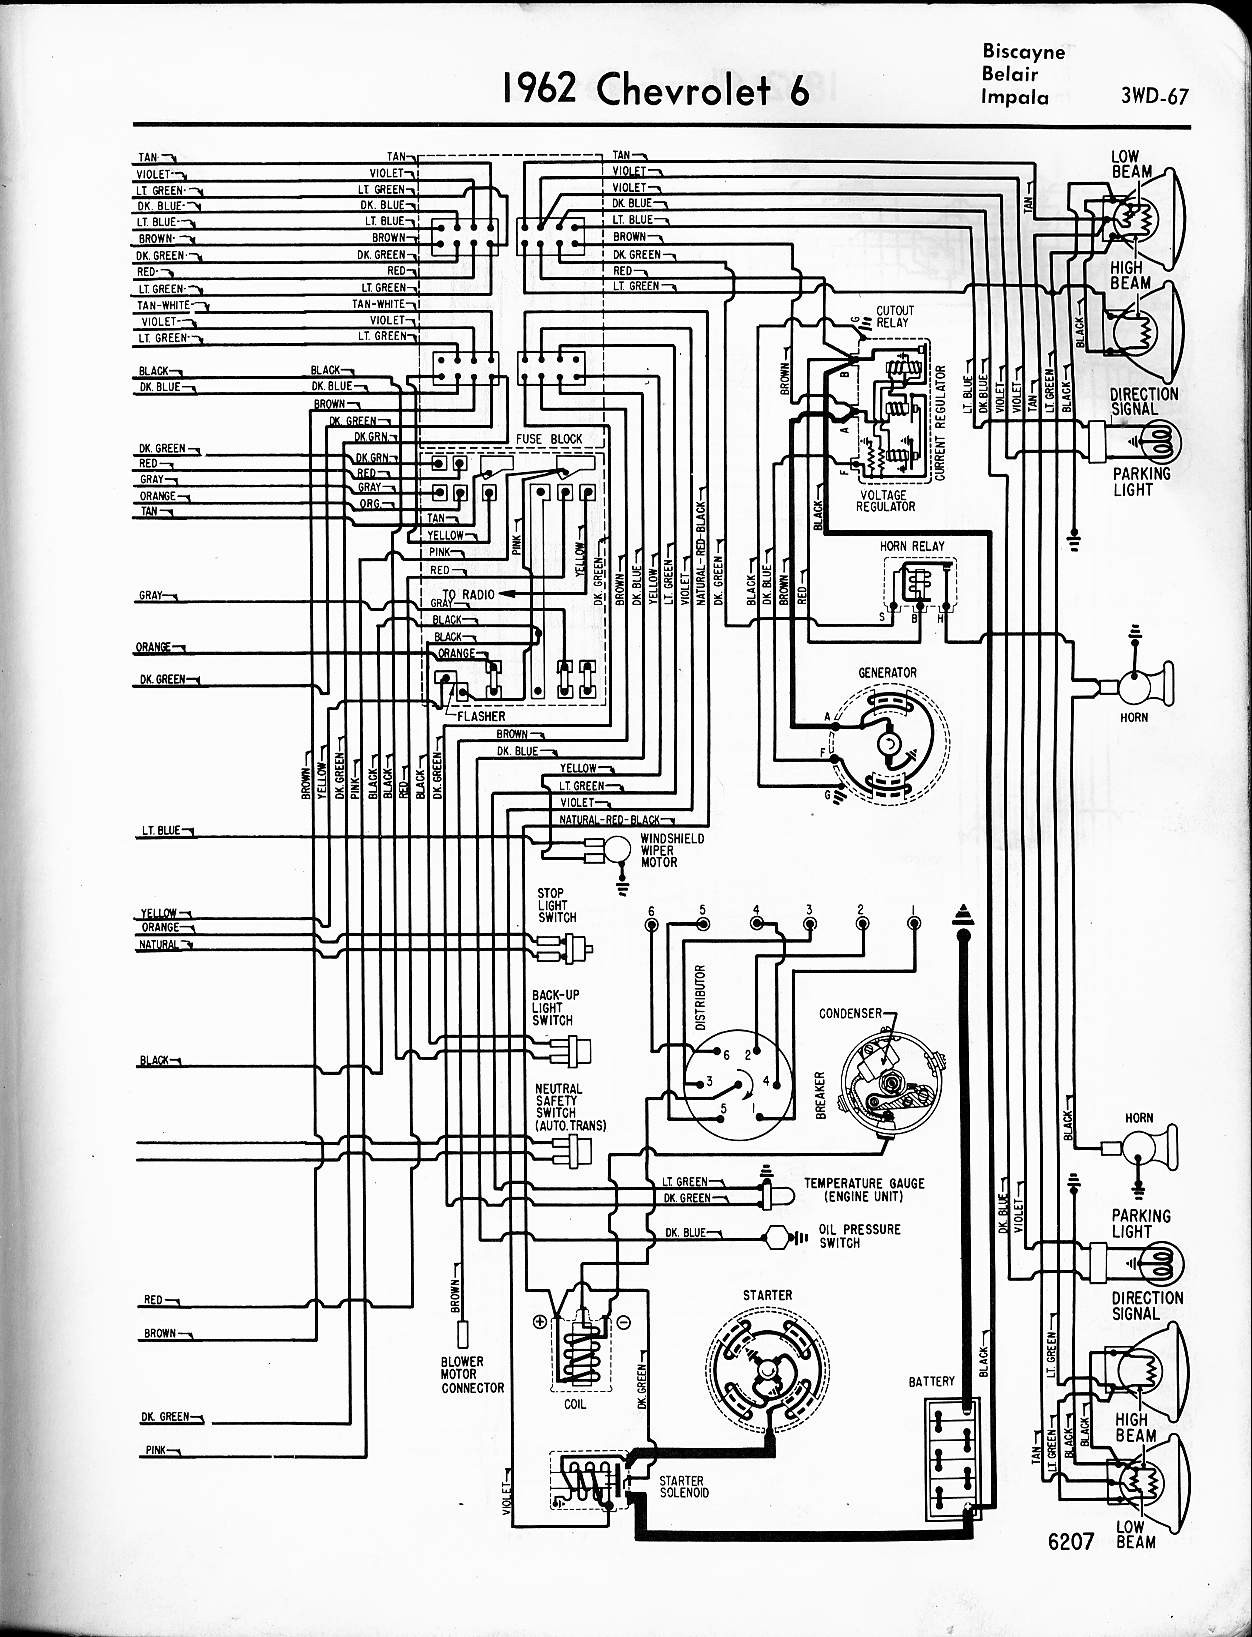 1962 Chevy Truck Wiring Diagram 57 65 Chevy Wiring